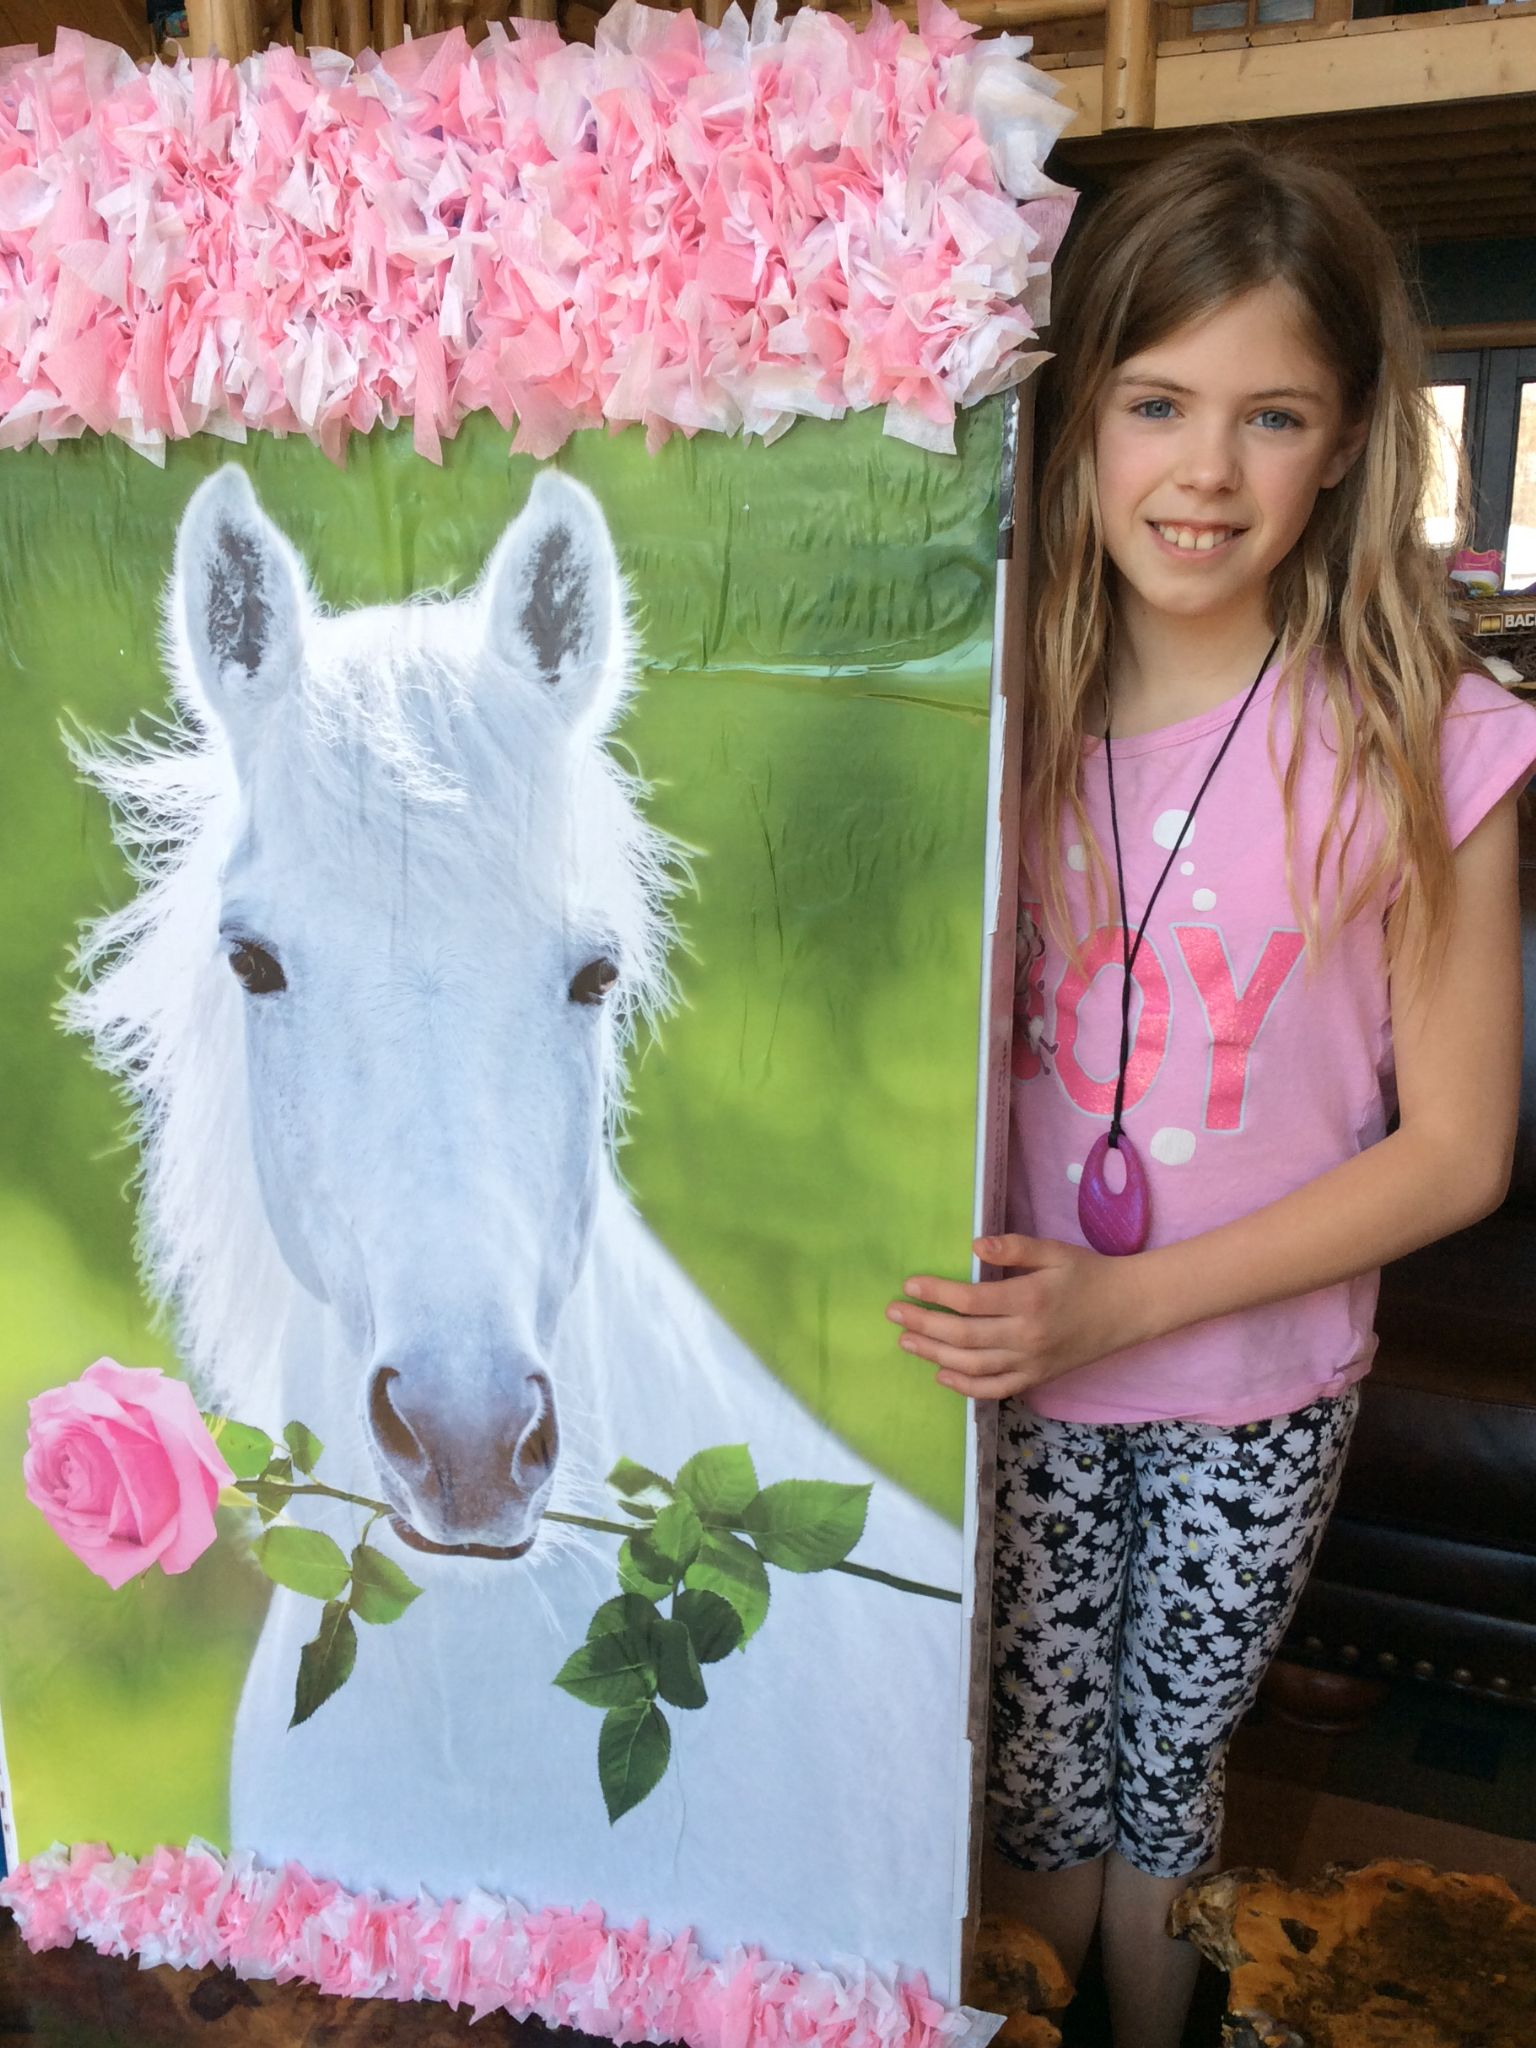 Giant Horse Piñata for under $5 TVbox+poster+tissue